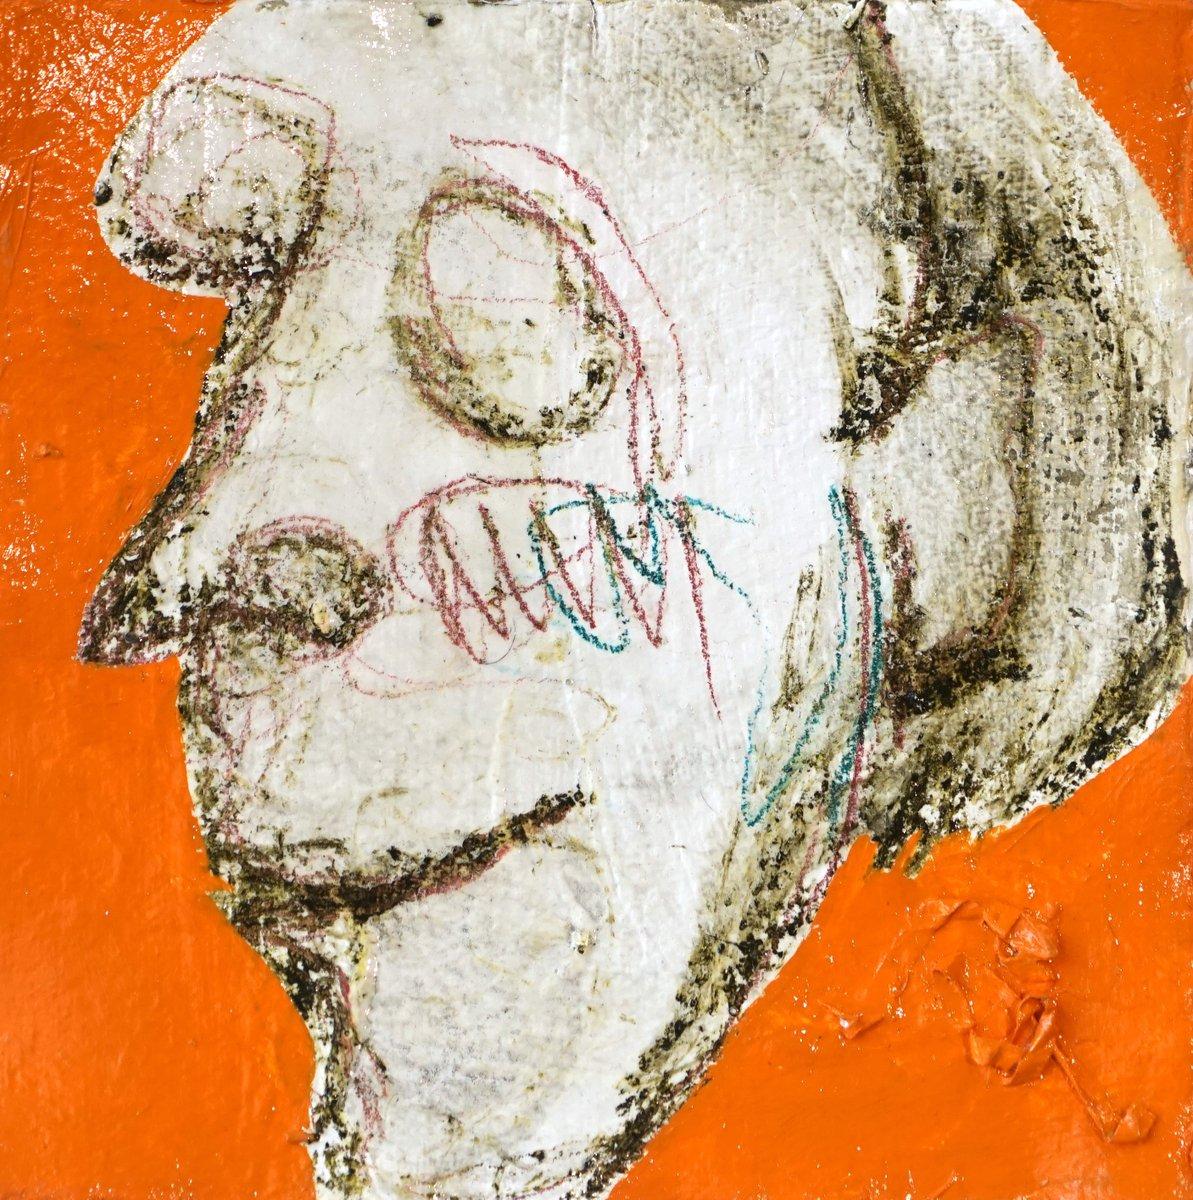 "9"" x 9"" Oil Painting $150 . . . . . . . . . . . . . #head #face #painting #grasp #fineart #decor #wallart #figure #figurative #womanmodel #lips #nose #hair #hold  #interiordesign #graceandfrankie #klimt #impressionist #expressionist #expression #headless"